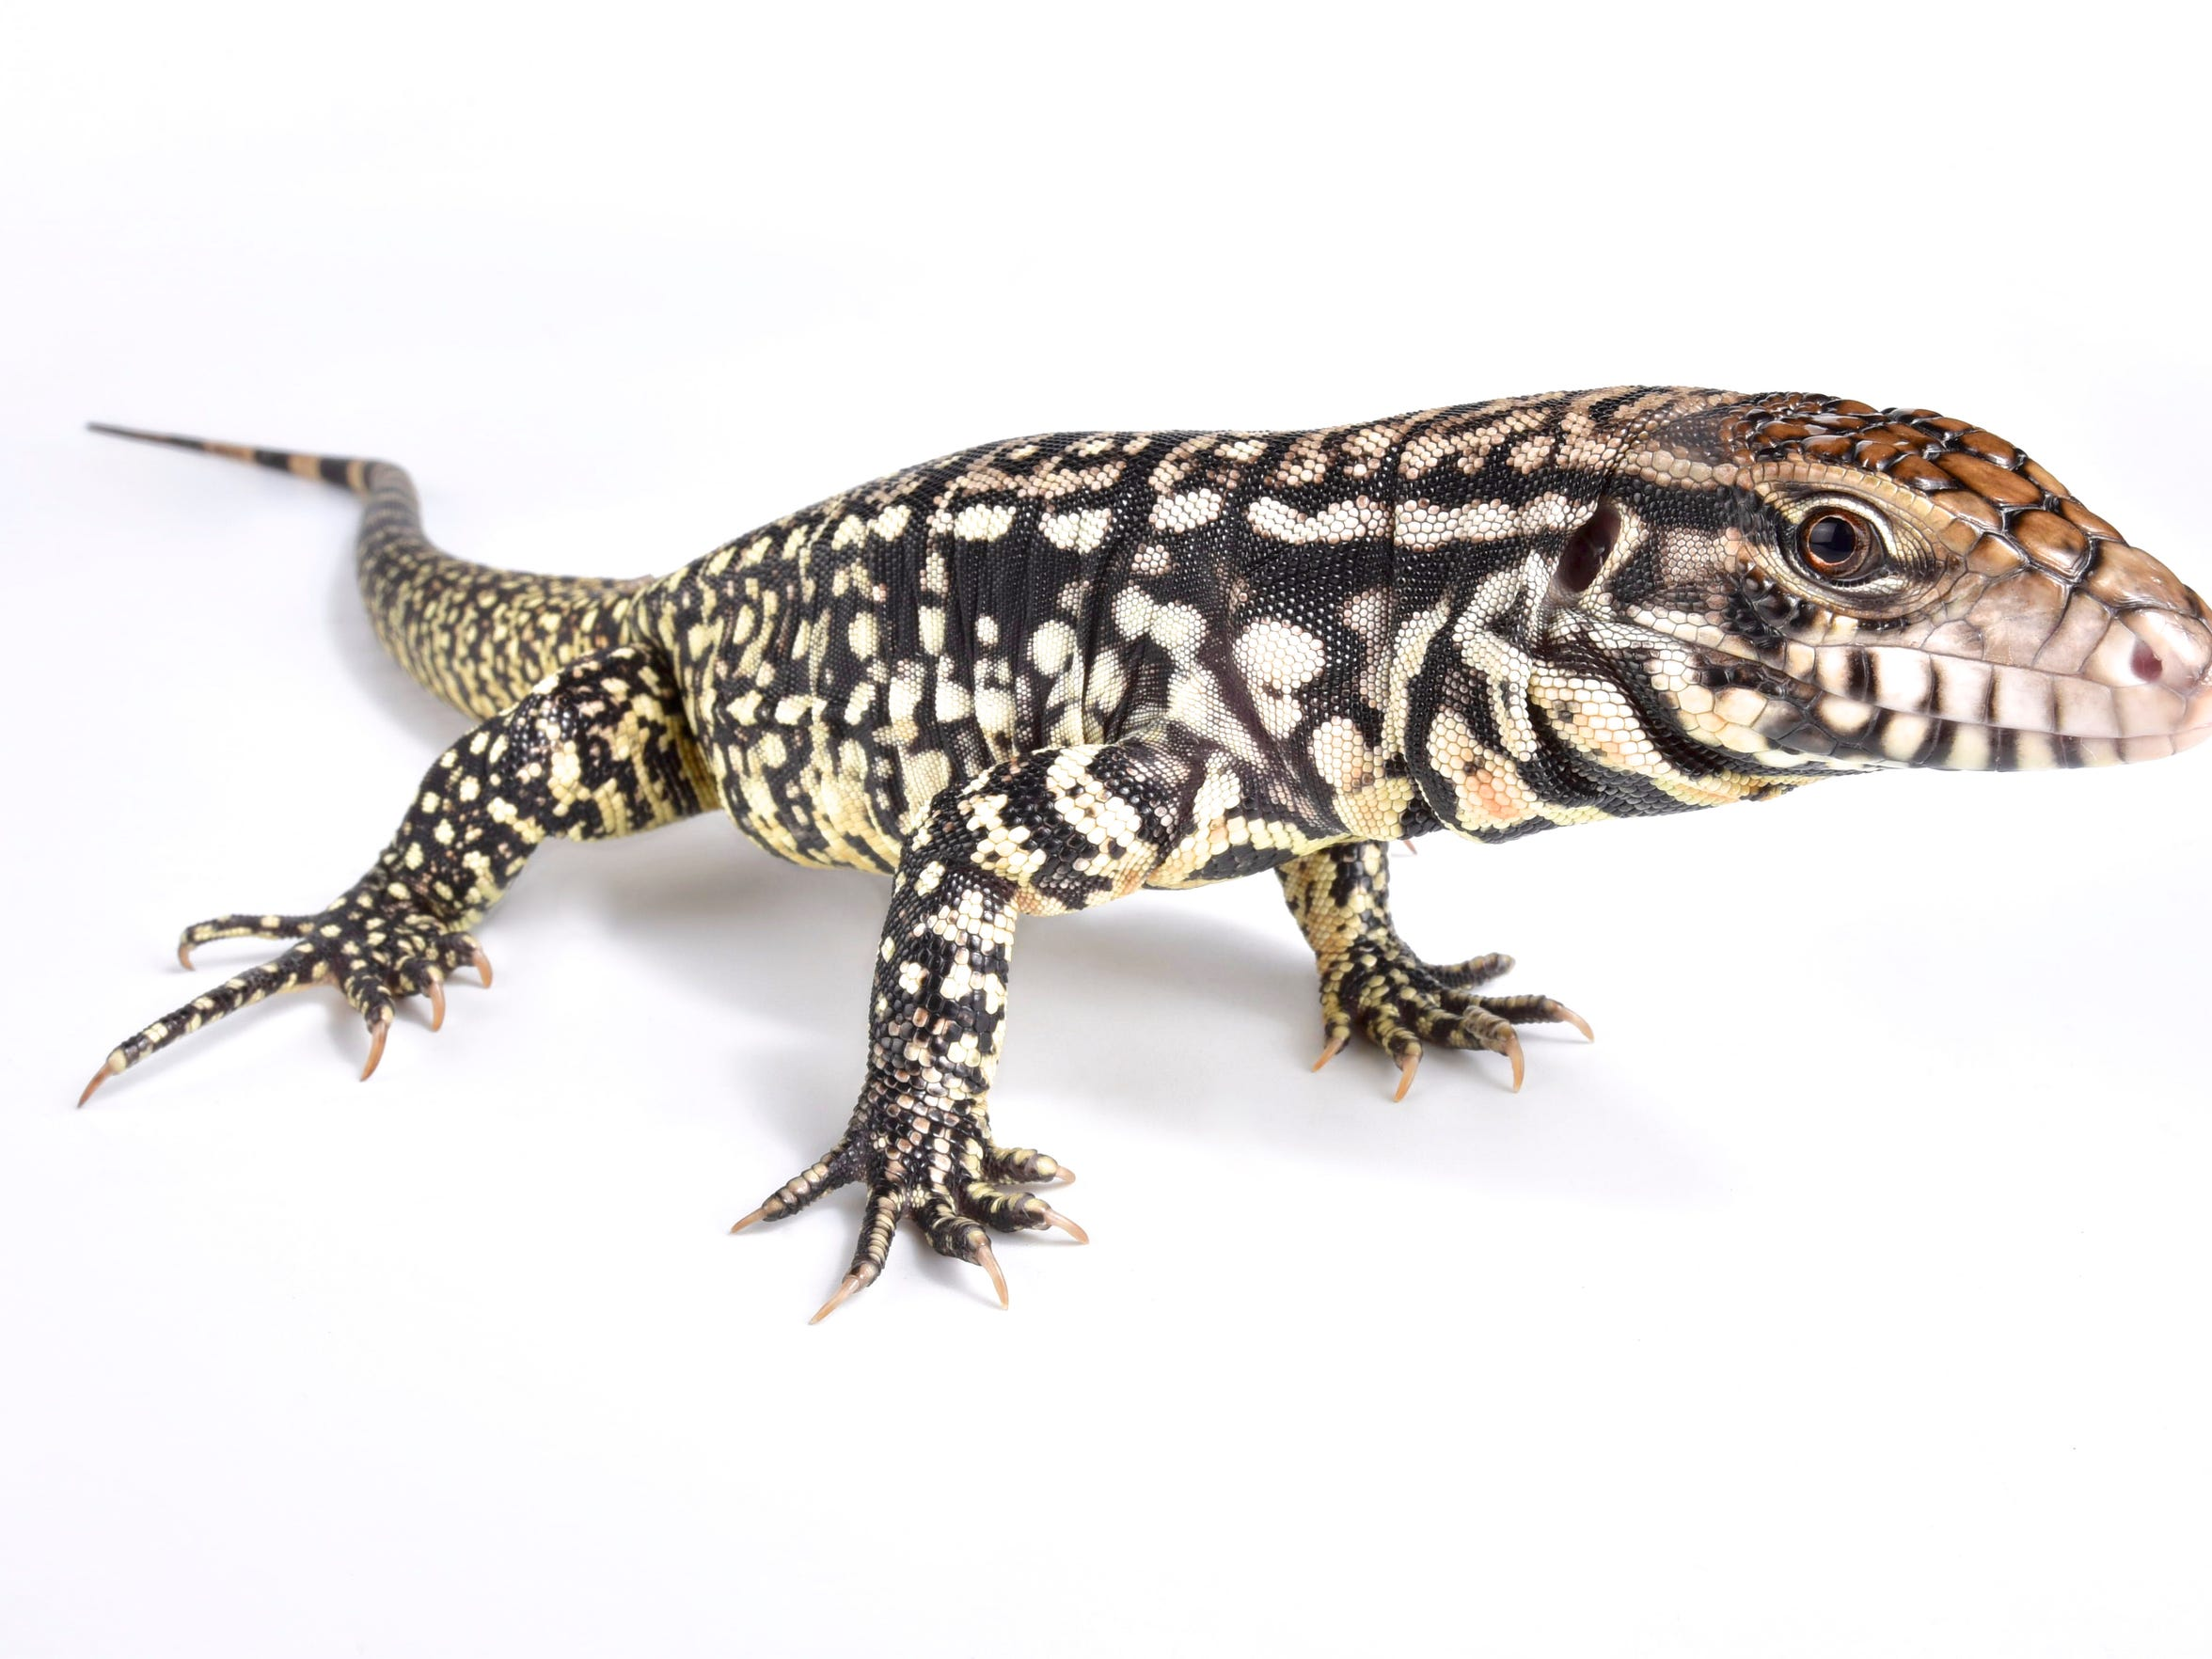 Argentine black and white tegu lizard